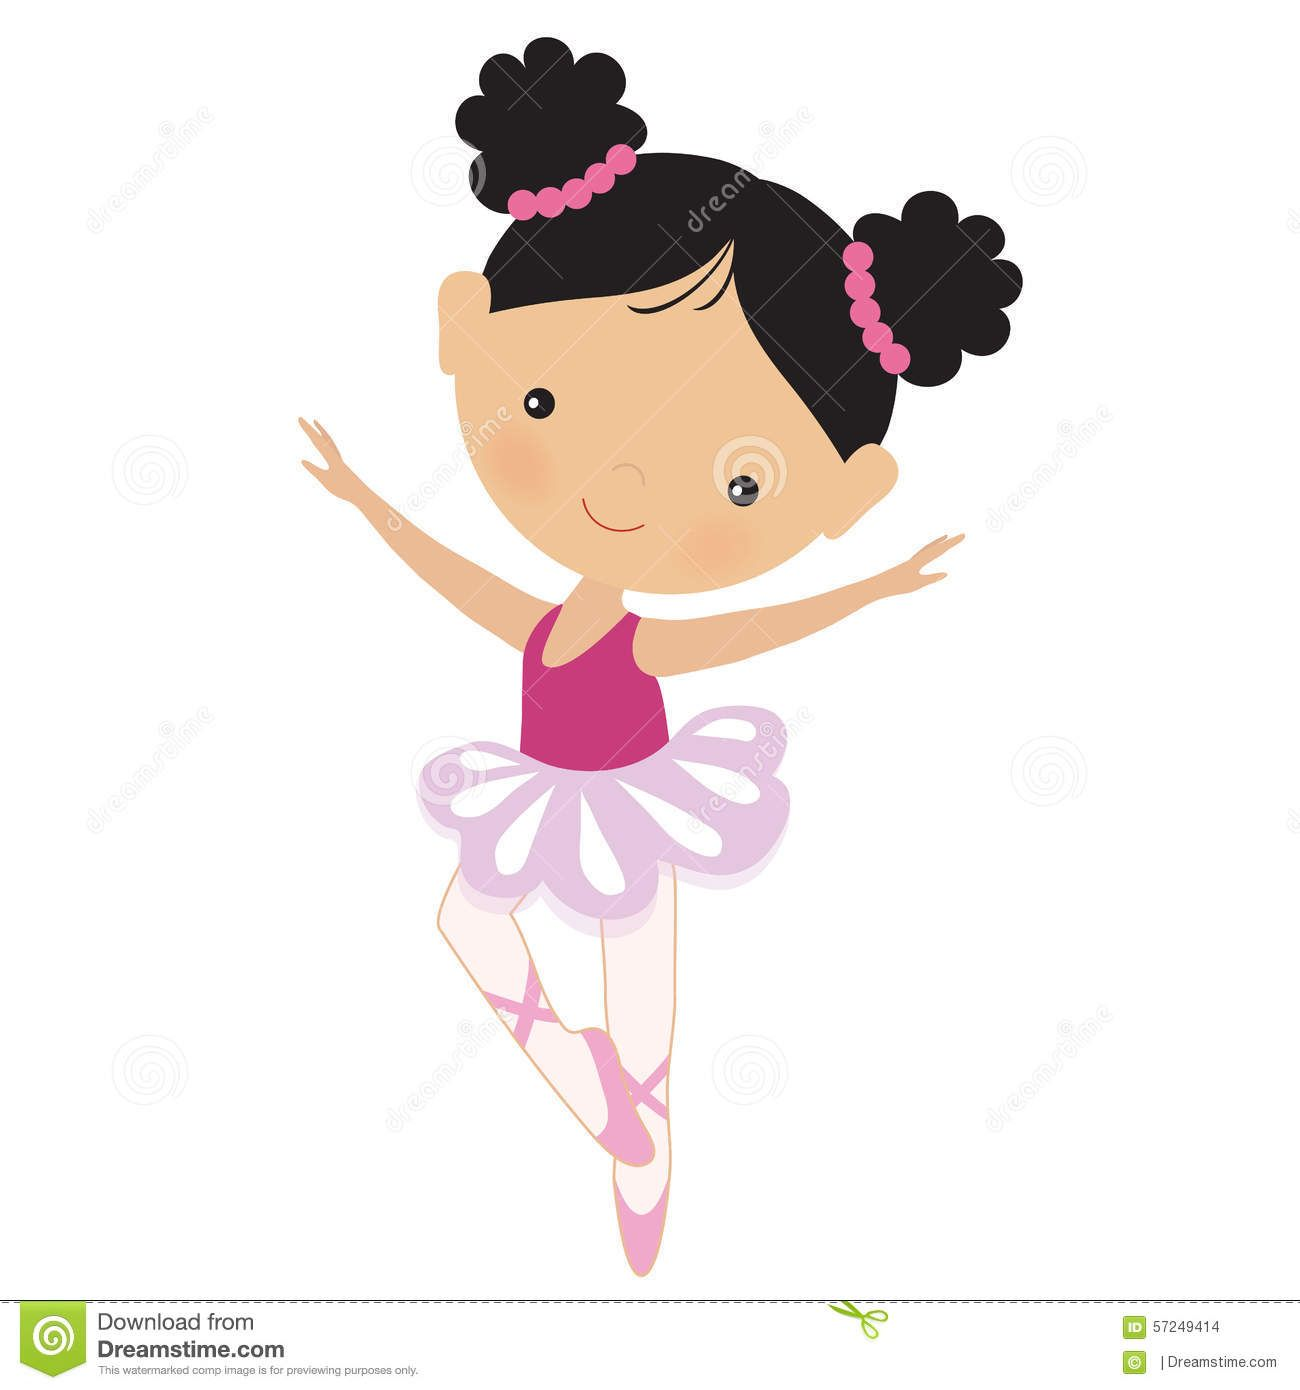 Cute Pink Ballerina Vector Illustration - Download From ...